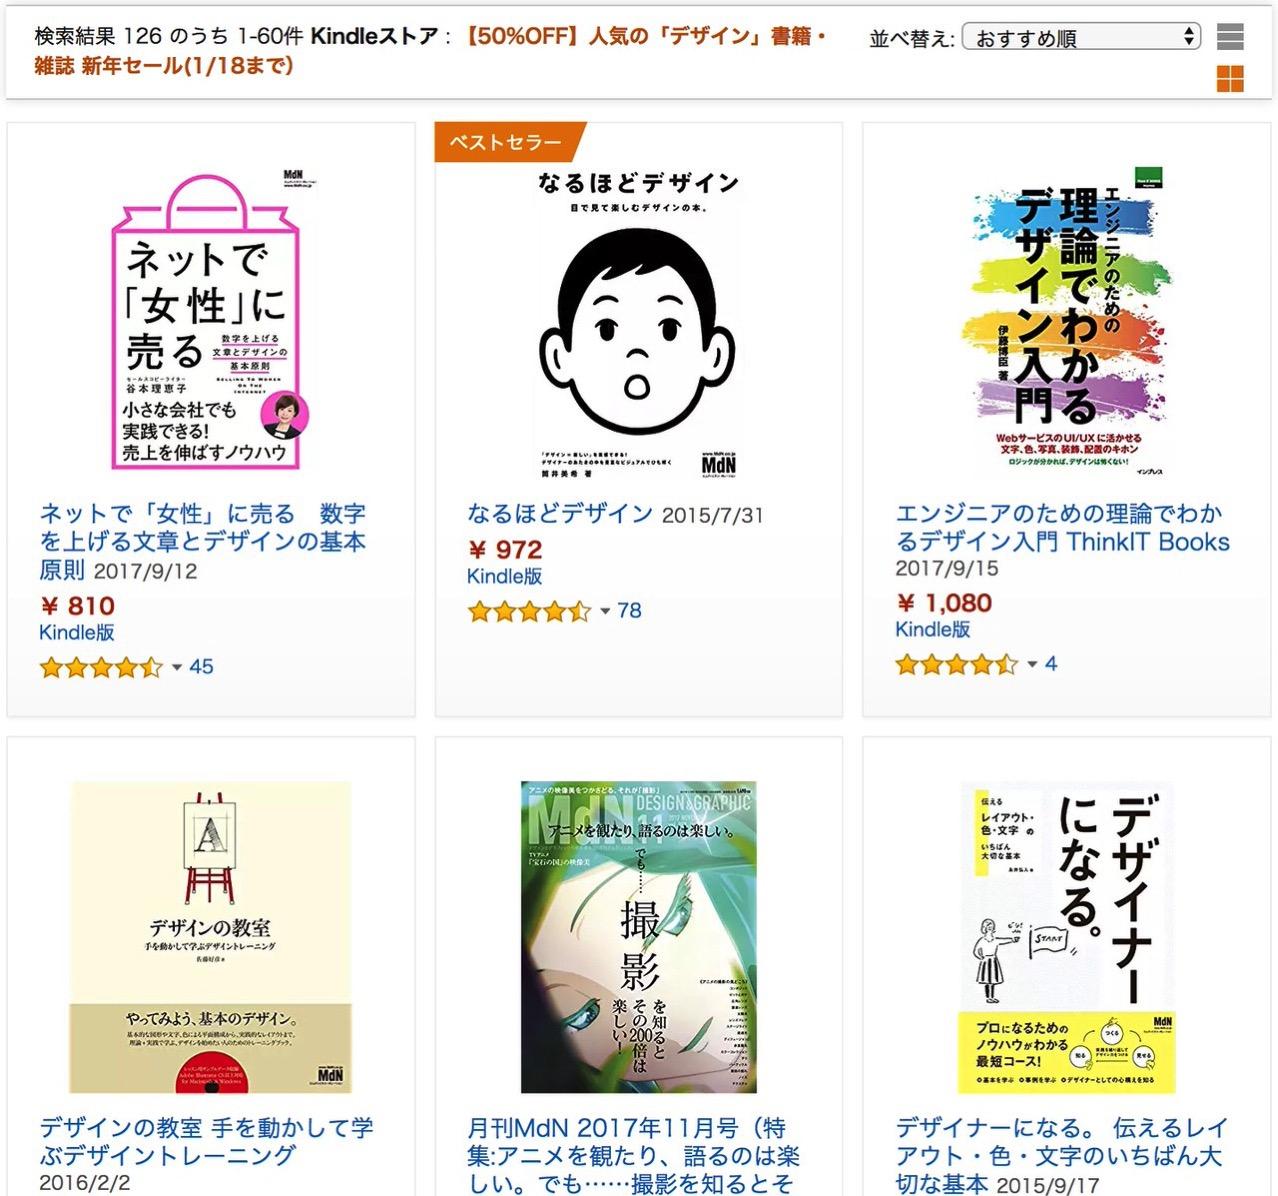 【Kindleセール】50%OFF!人気の「デザイン」書籍・雑誌 新年セール(1/18まで)